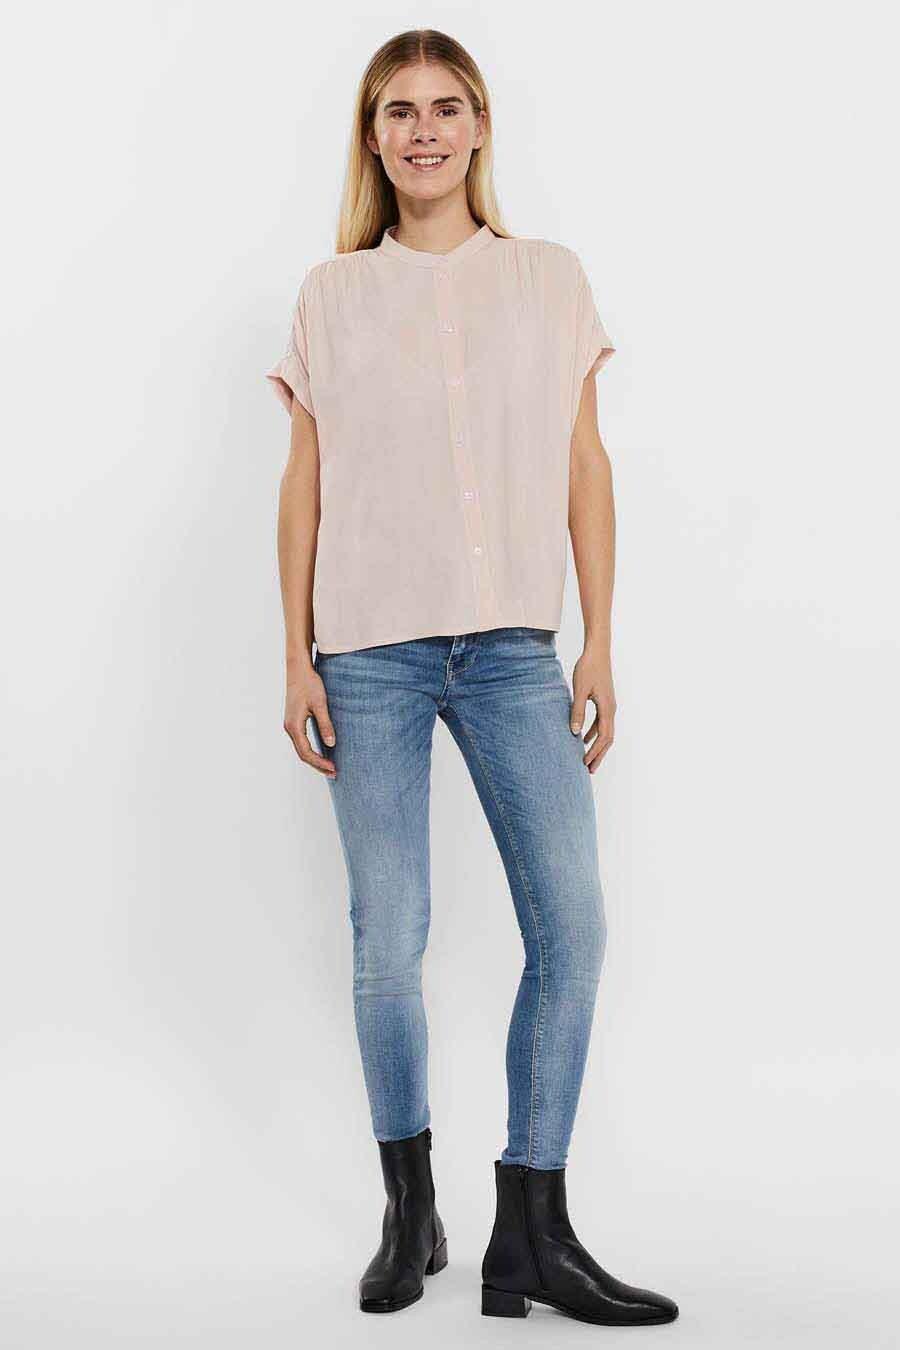 Vero Moda® Blouse korte mouwen, Roze, Dames, Maat: L